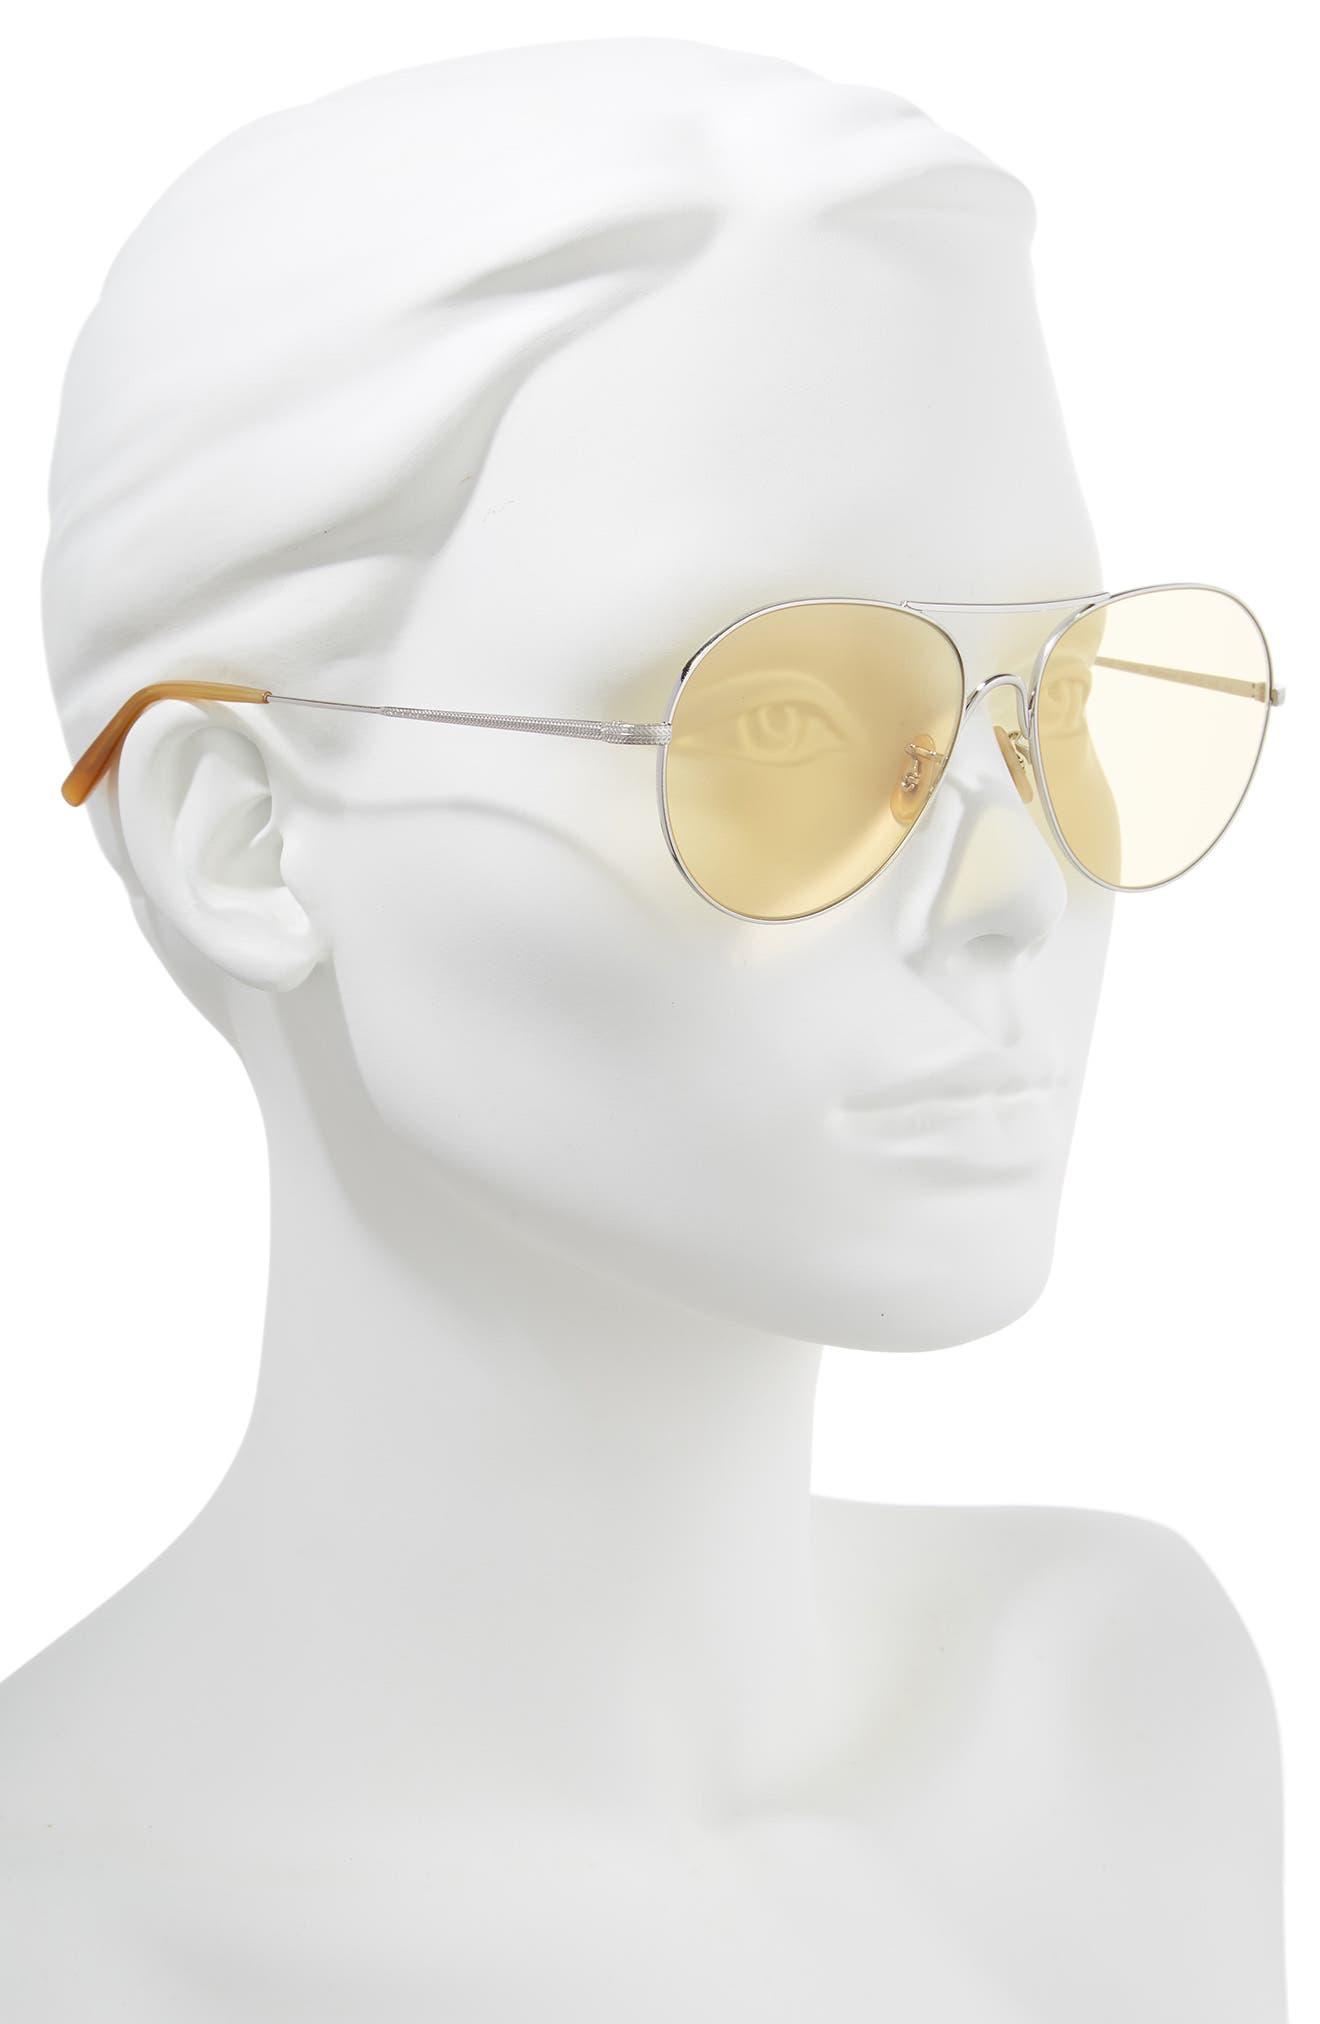 Rockmore 58mm Aviator Sunglasses,                             Alternate thumbnail 2, color,                             SILVER